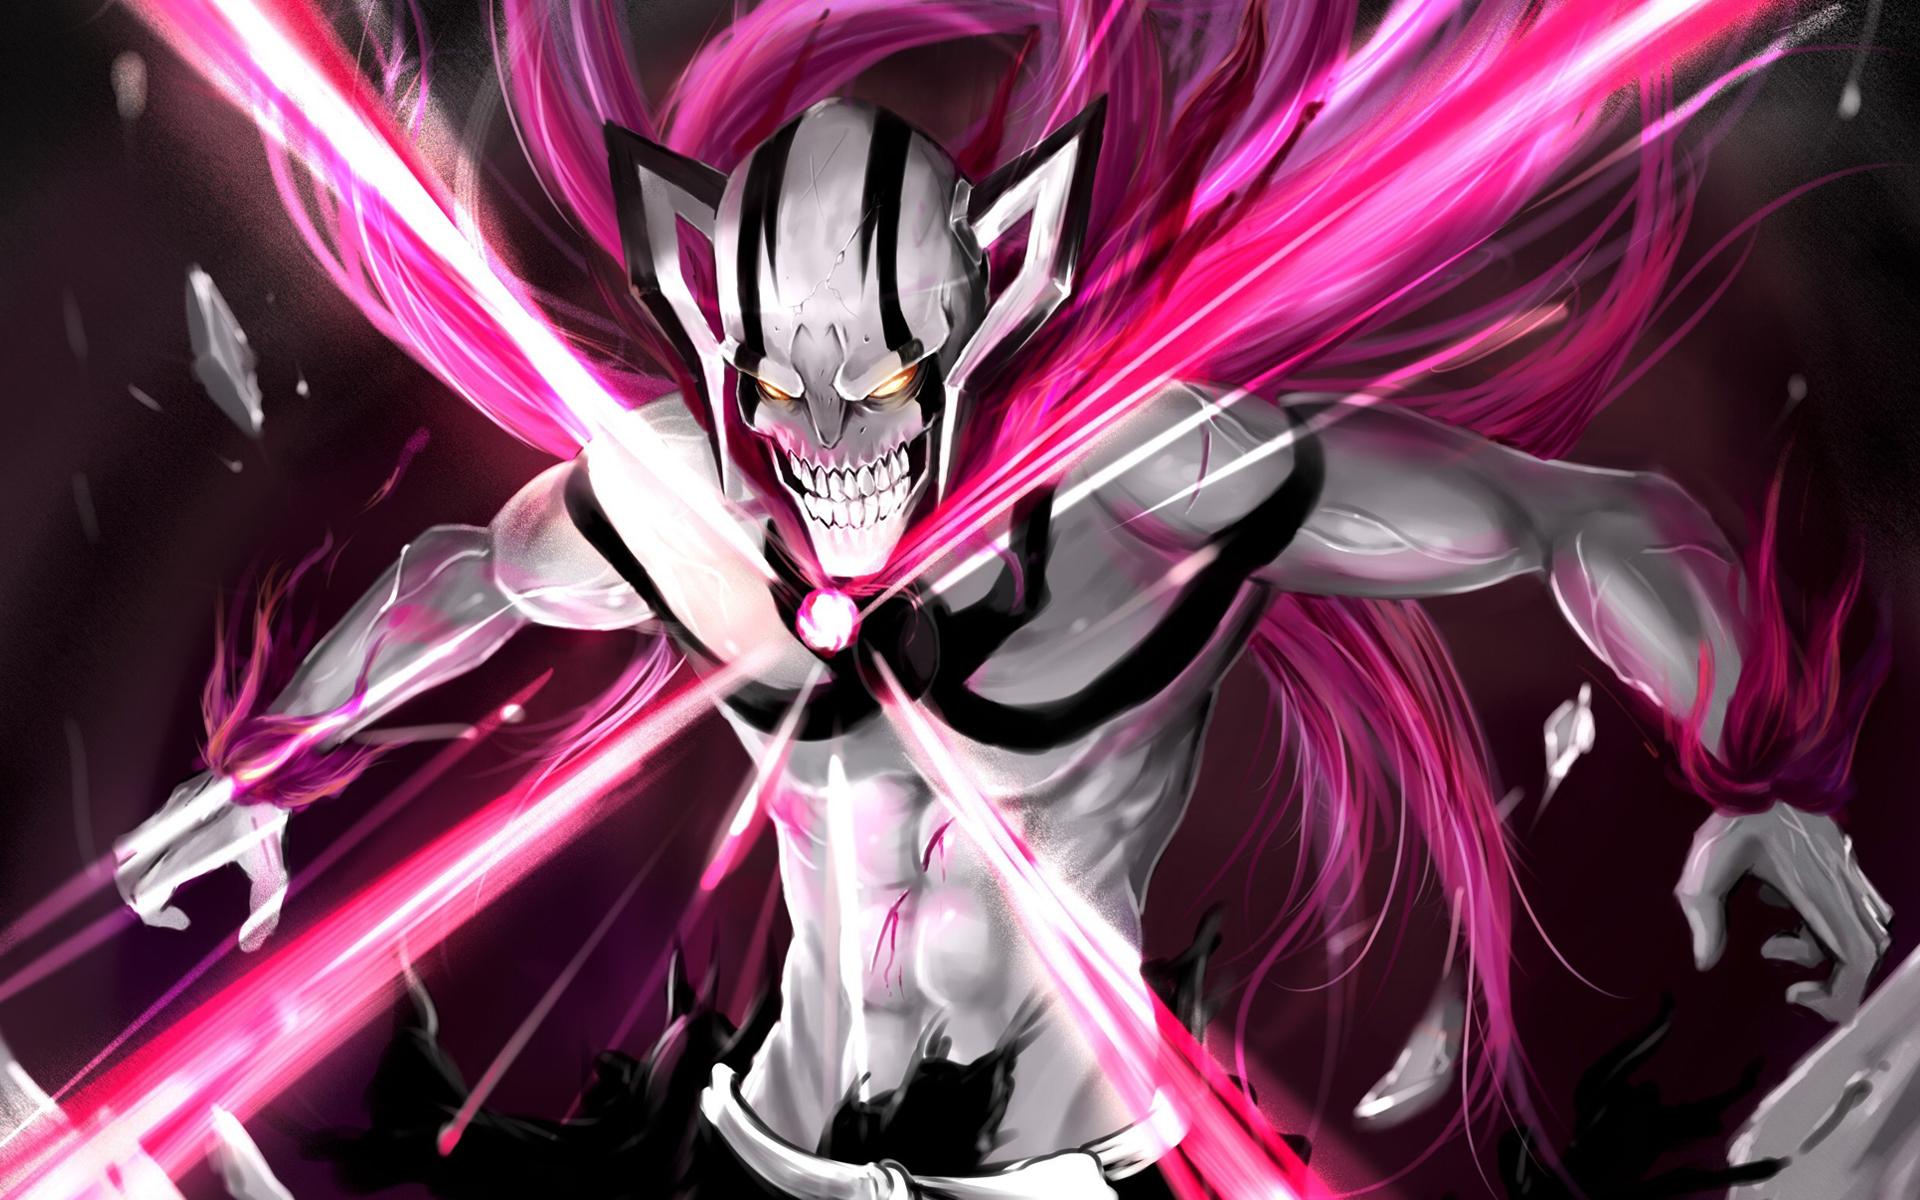 Bleach vasto lorde 8f wallpaper hd vasto lorde ichigo kurosaki anime hd wallpaper voltagebd Choice Image